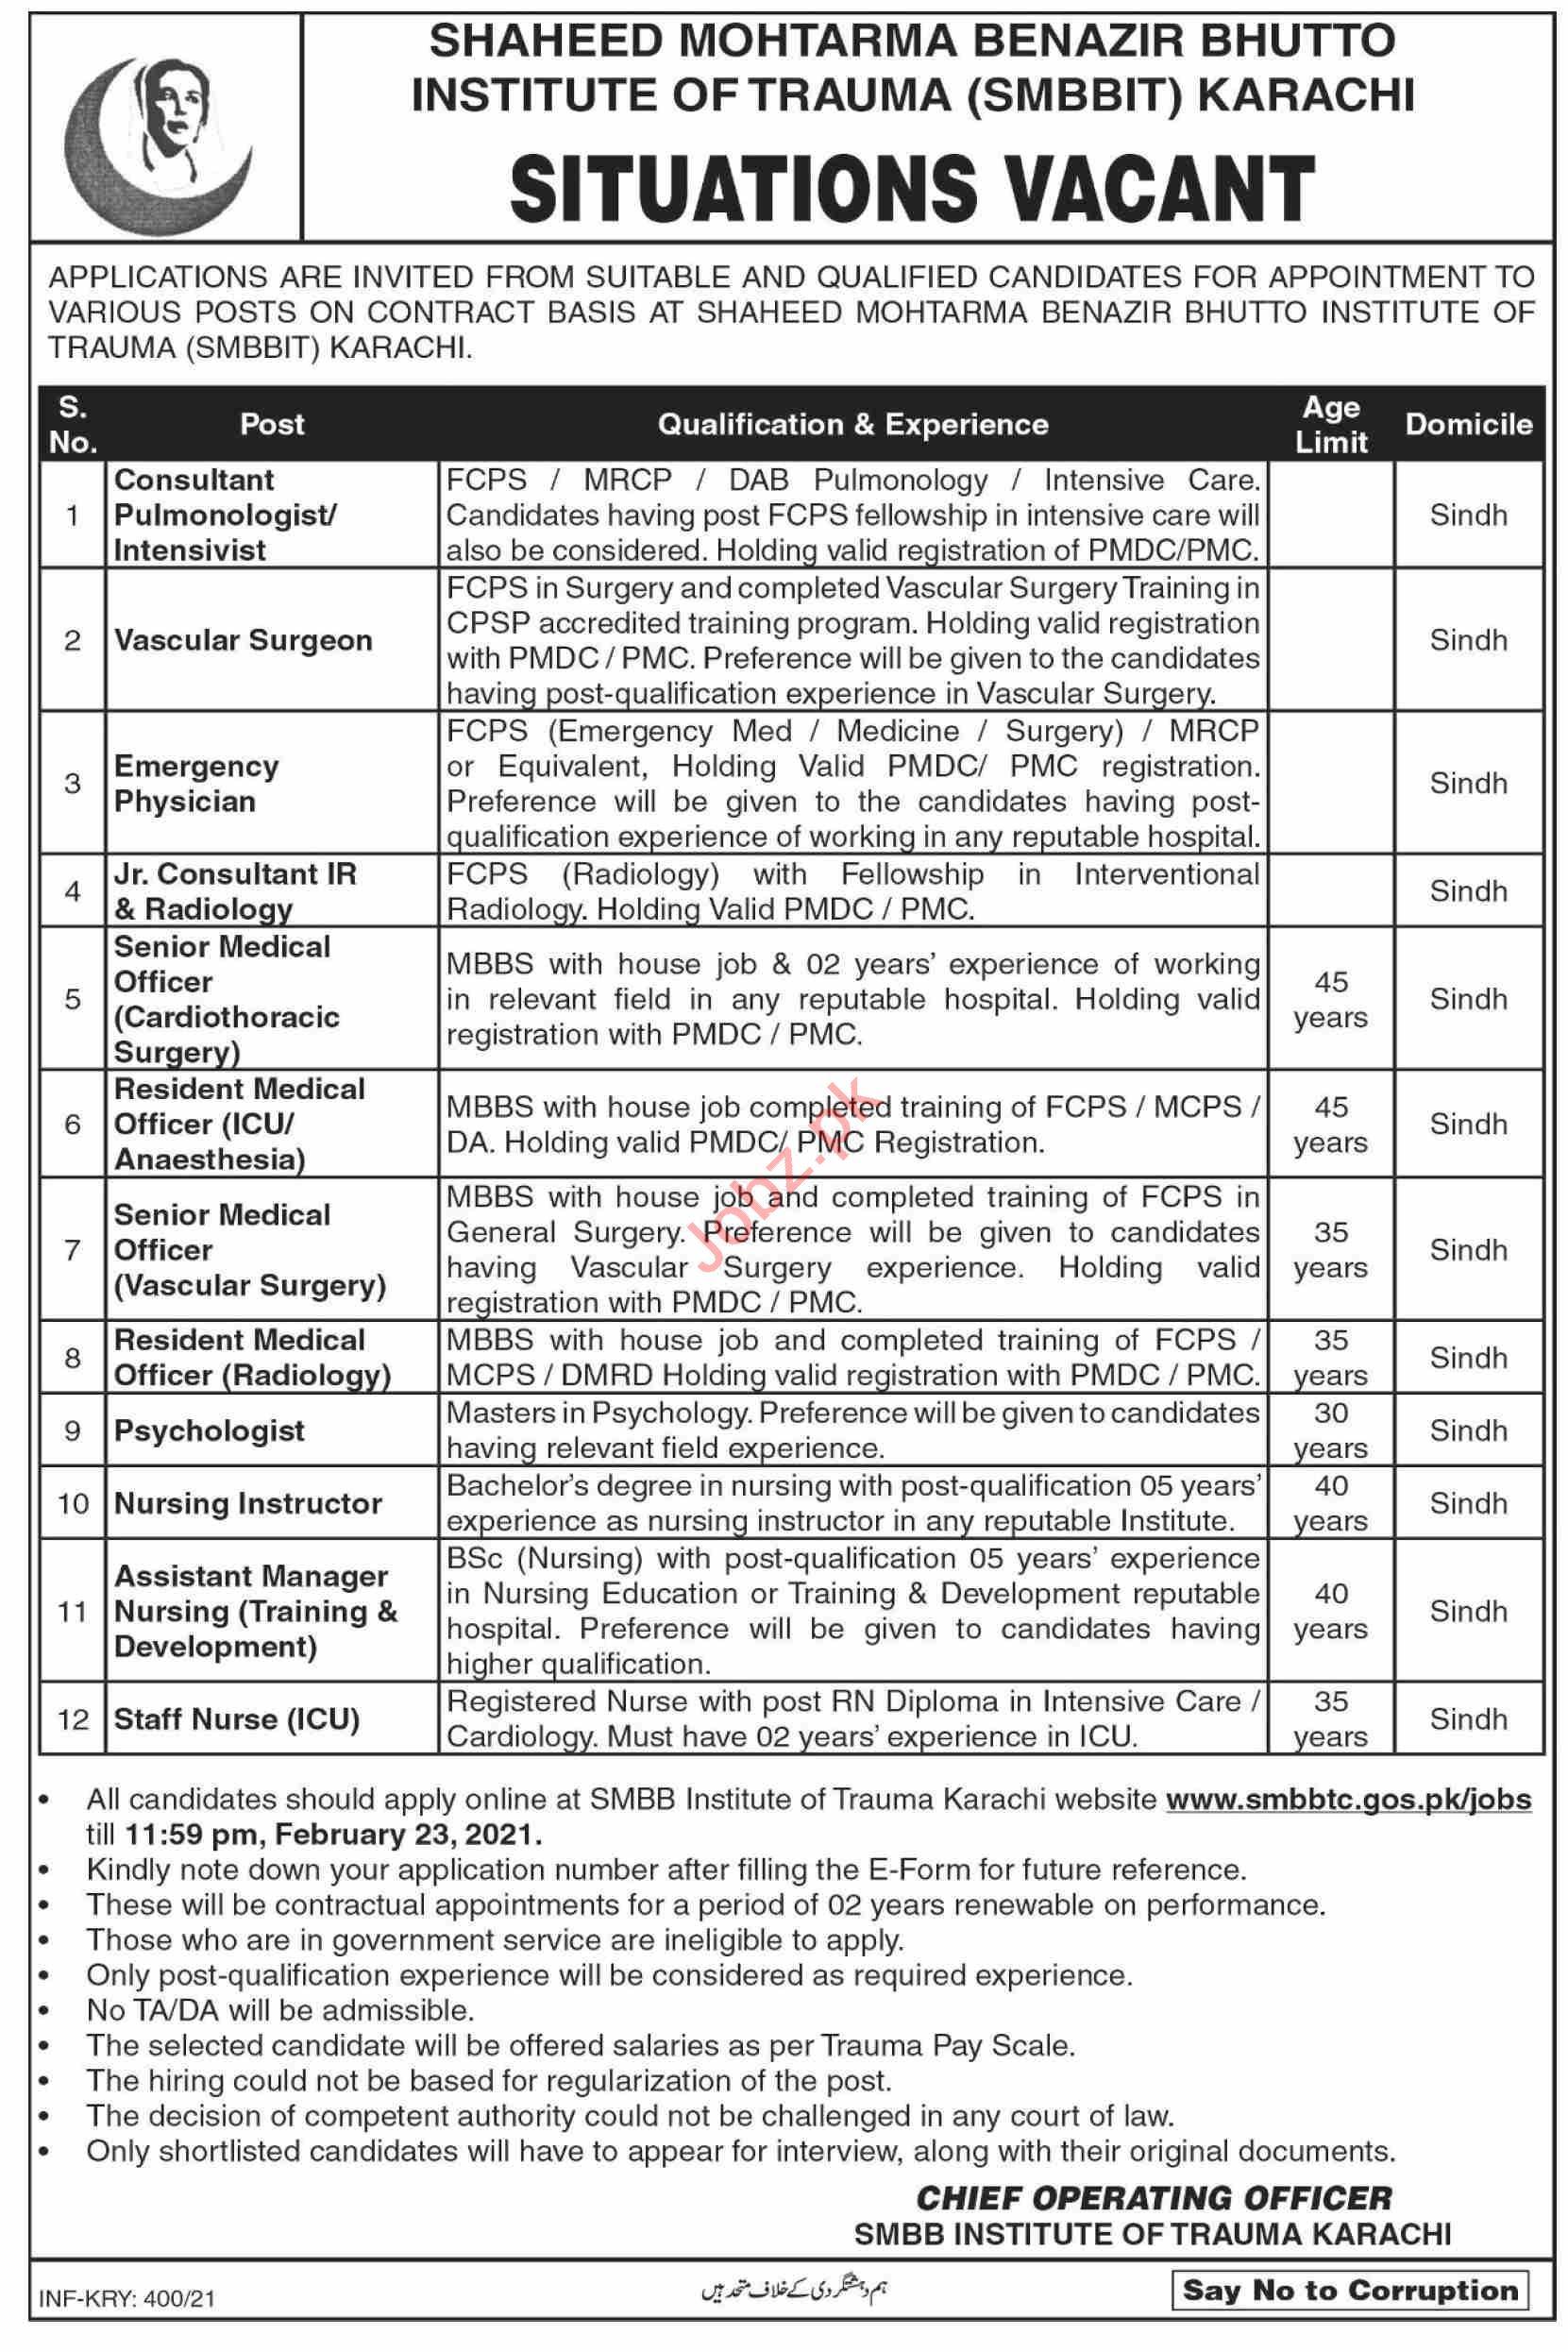 Shaheed Mohtarma Benazir Bhutto Institute of Trauma Jobs